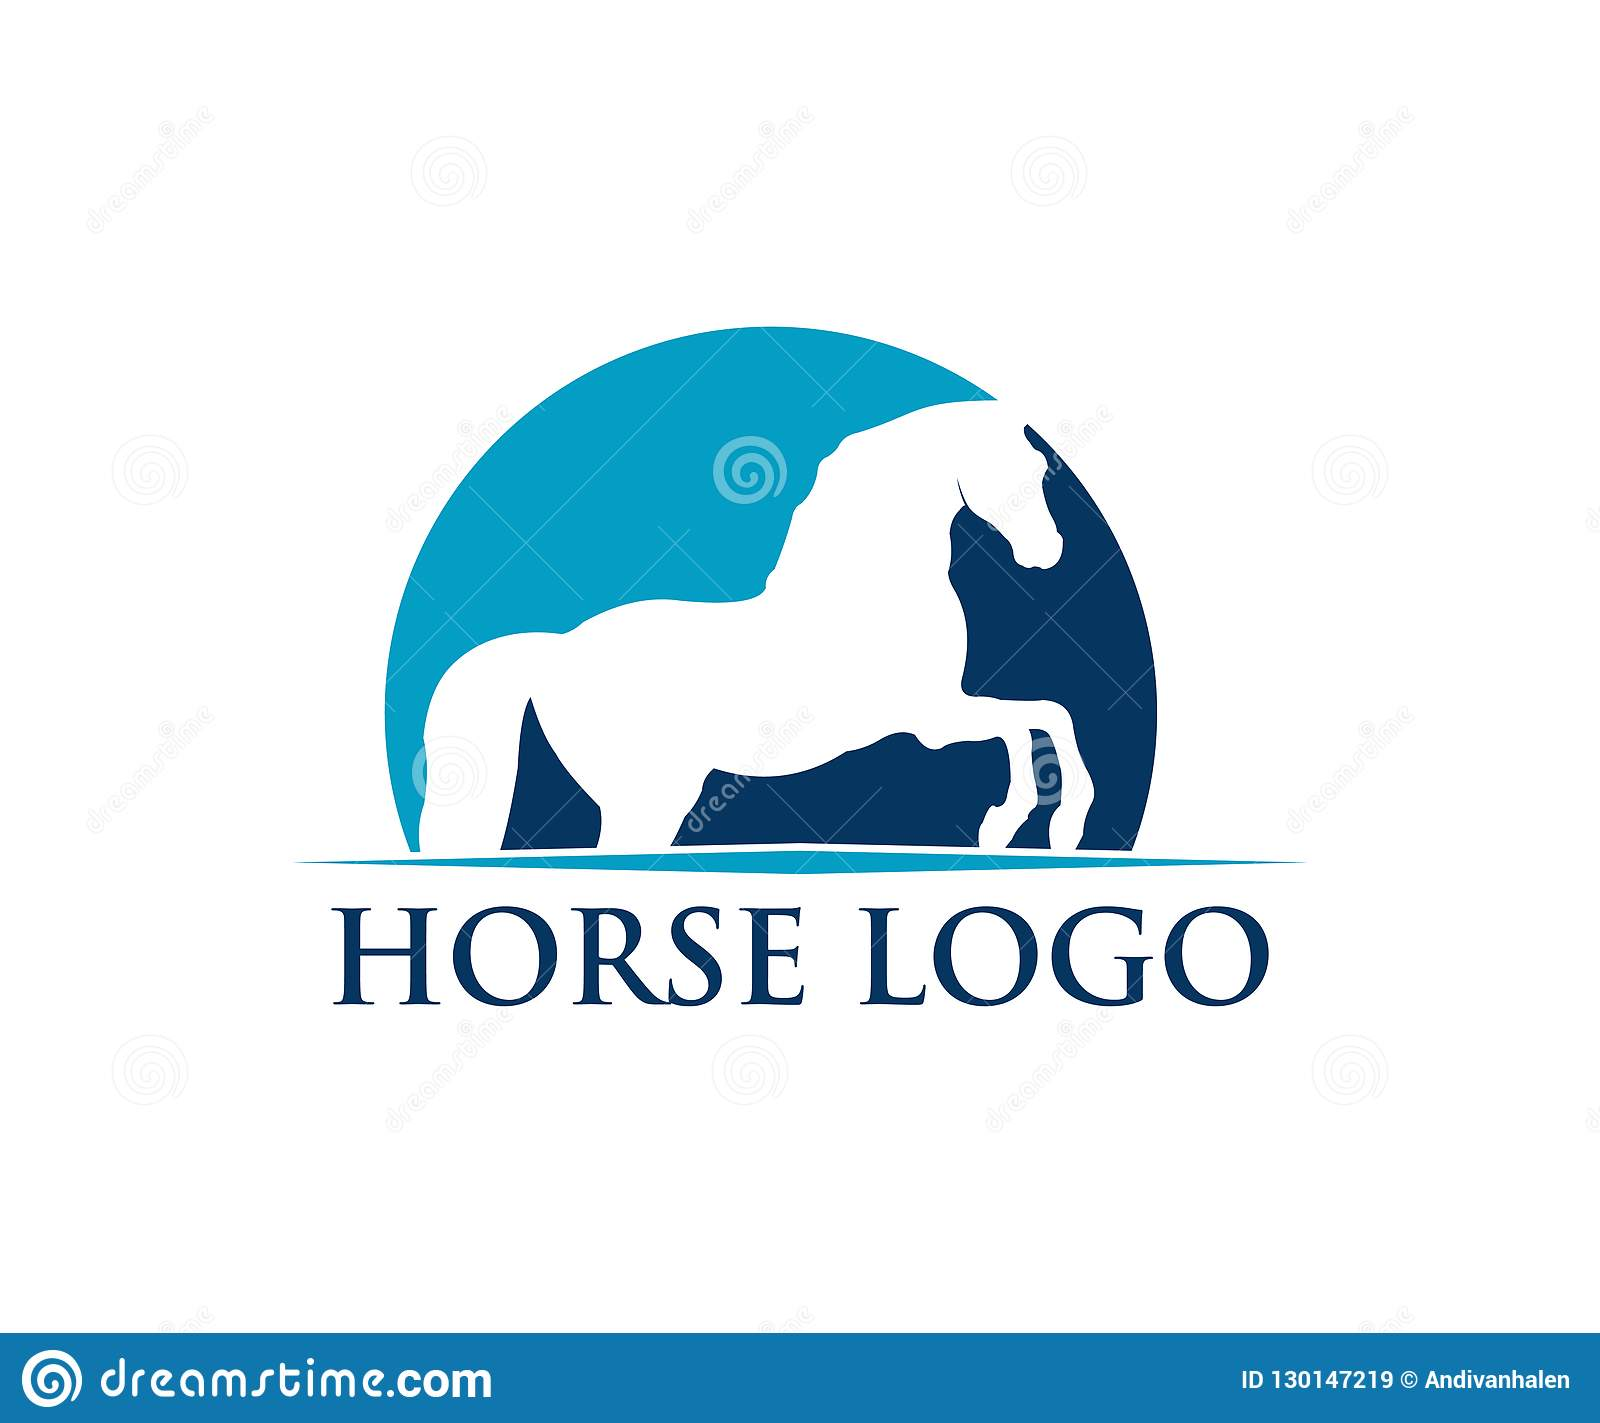 Simple Horse Sport Vector Logo Design Inspiration Stock Illustration Illustration Of Decoration Resort 130147219